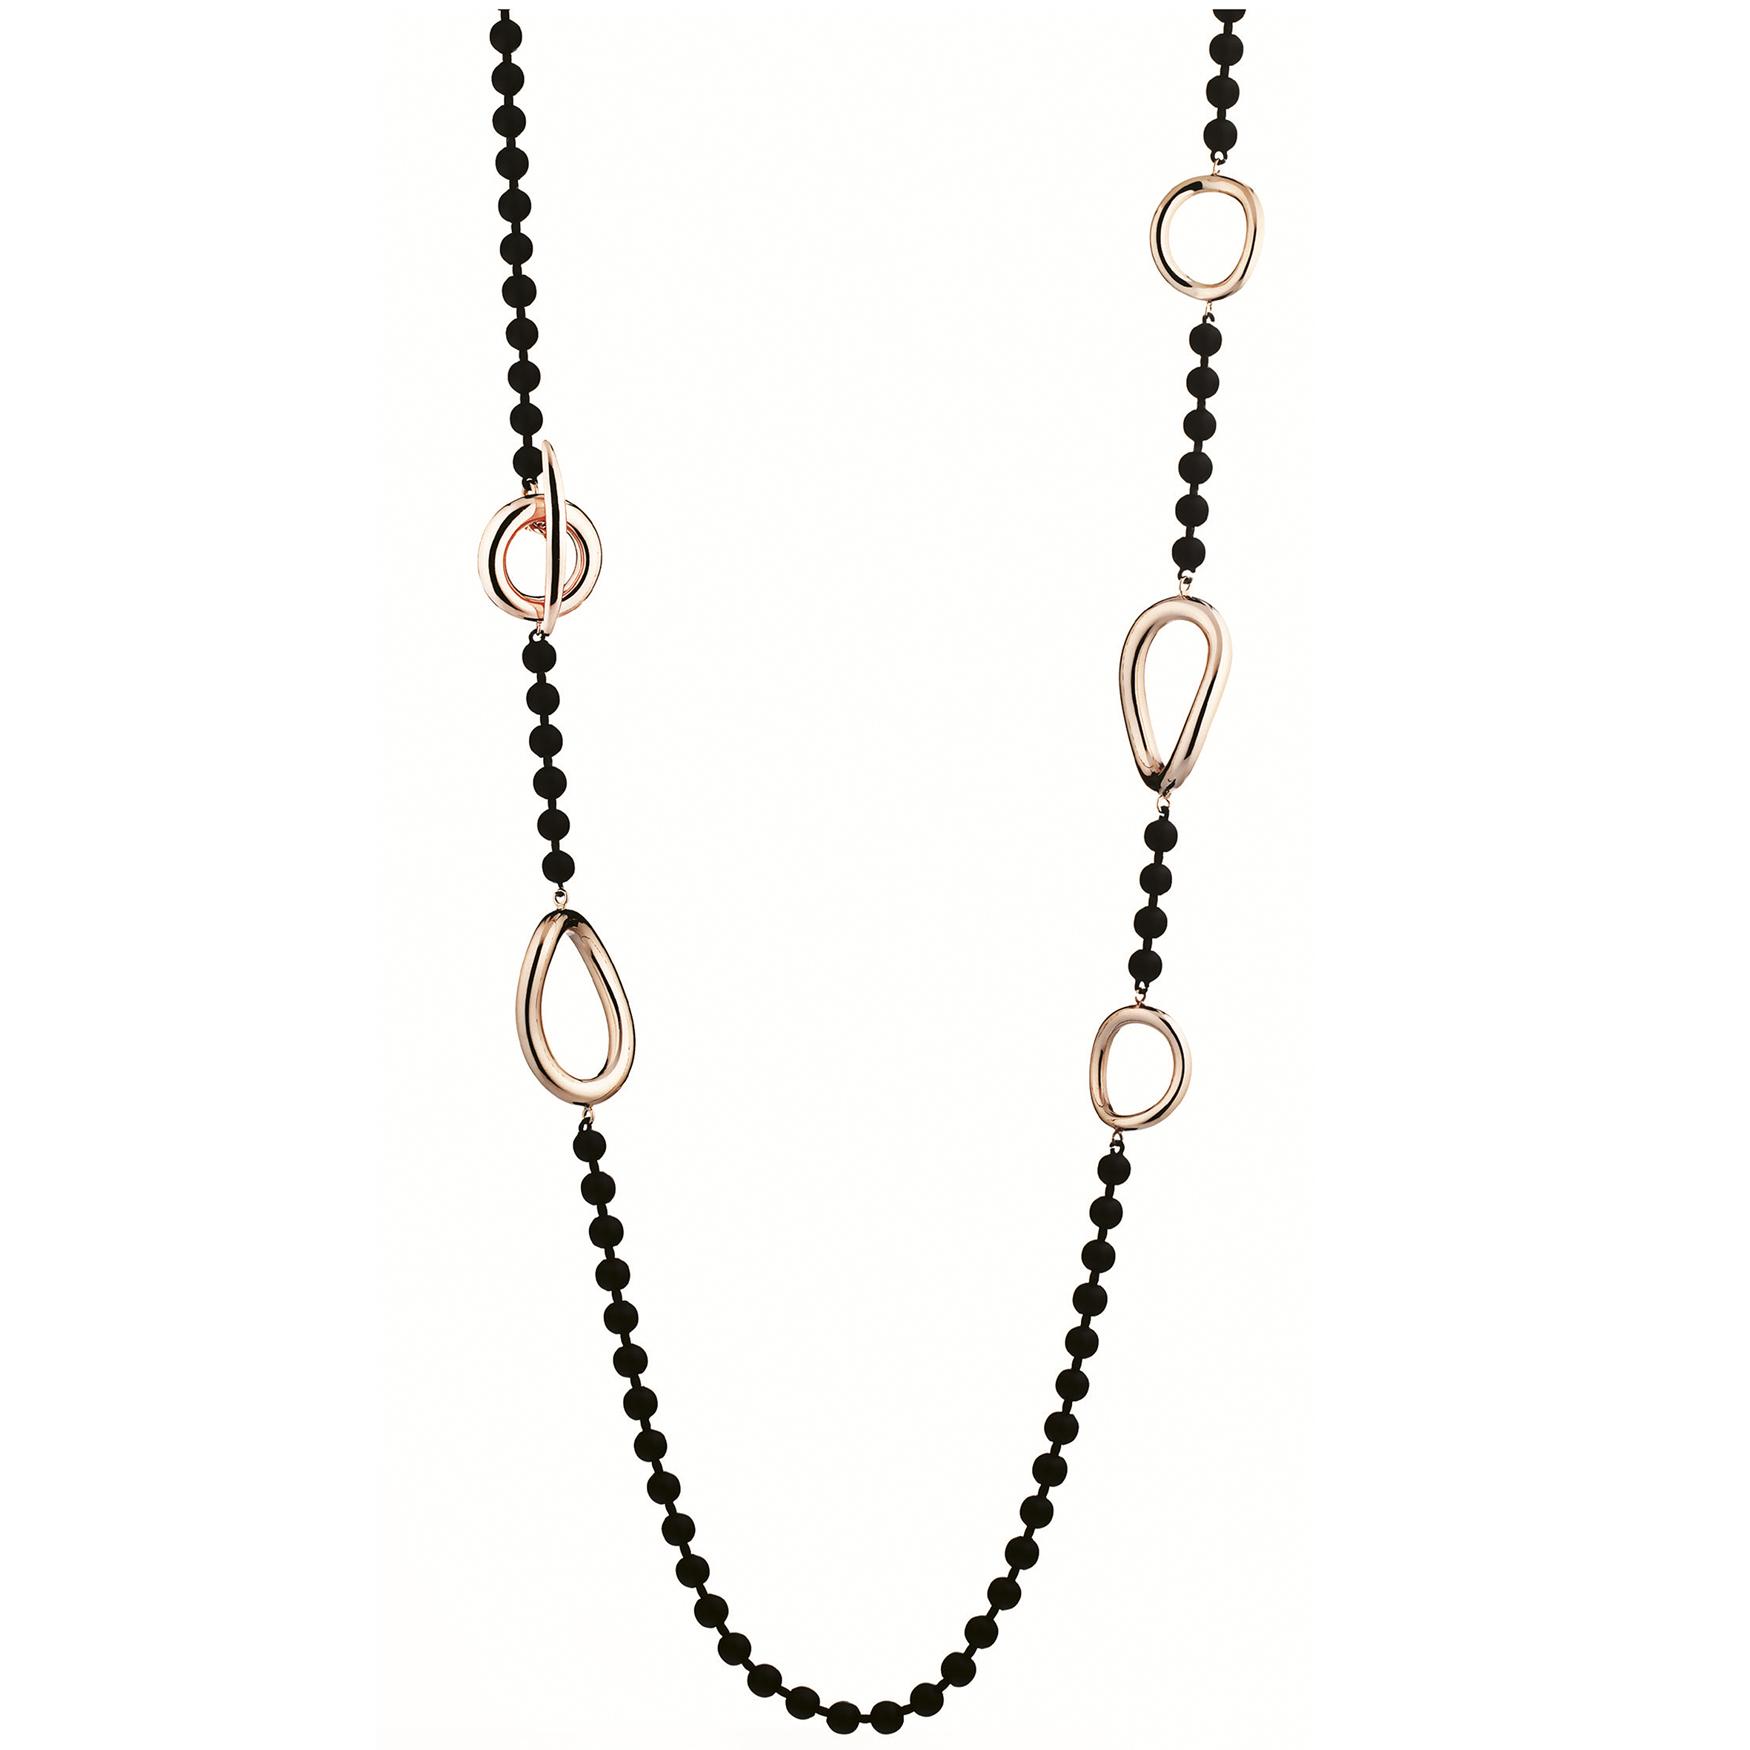 Sensi joyas jewellery Granada silver engagementSILVER AND ACRYLIC  PENDANT